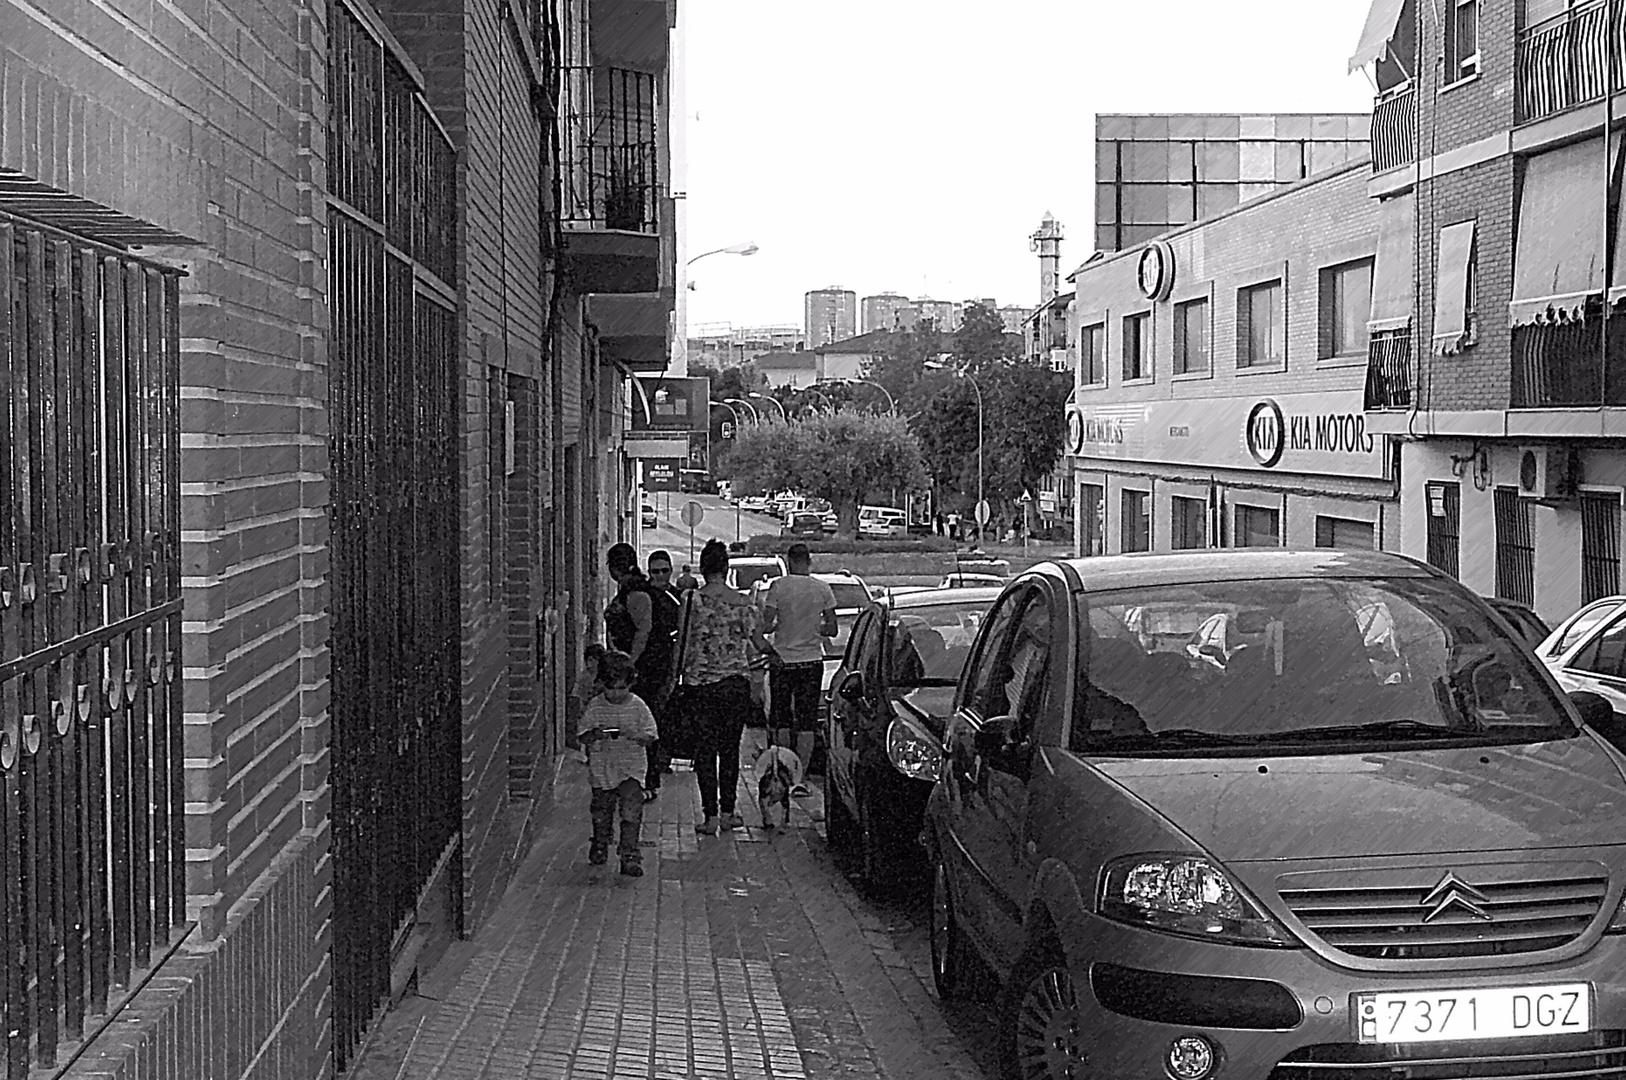 Calle con gente